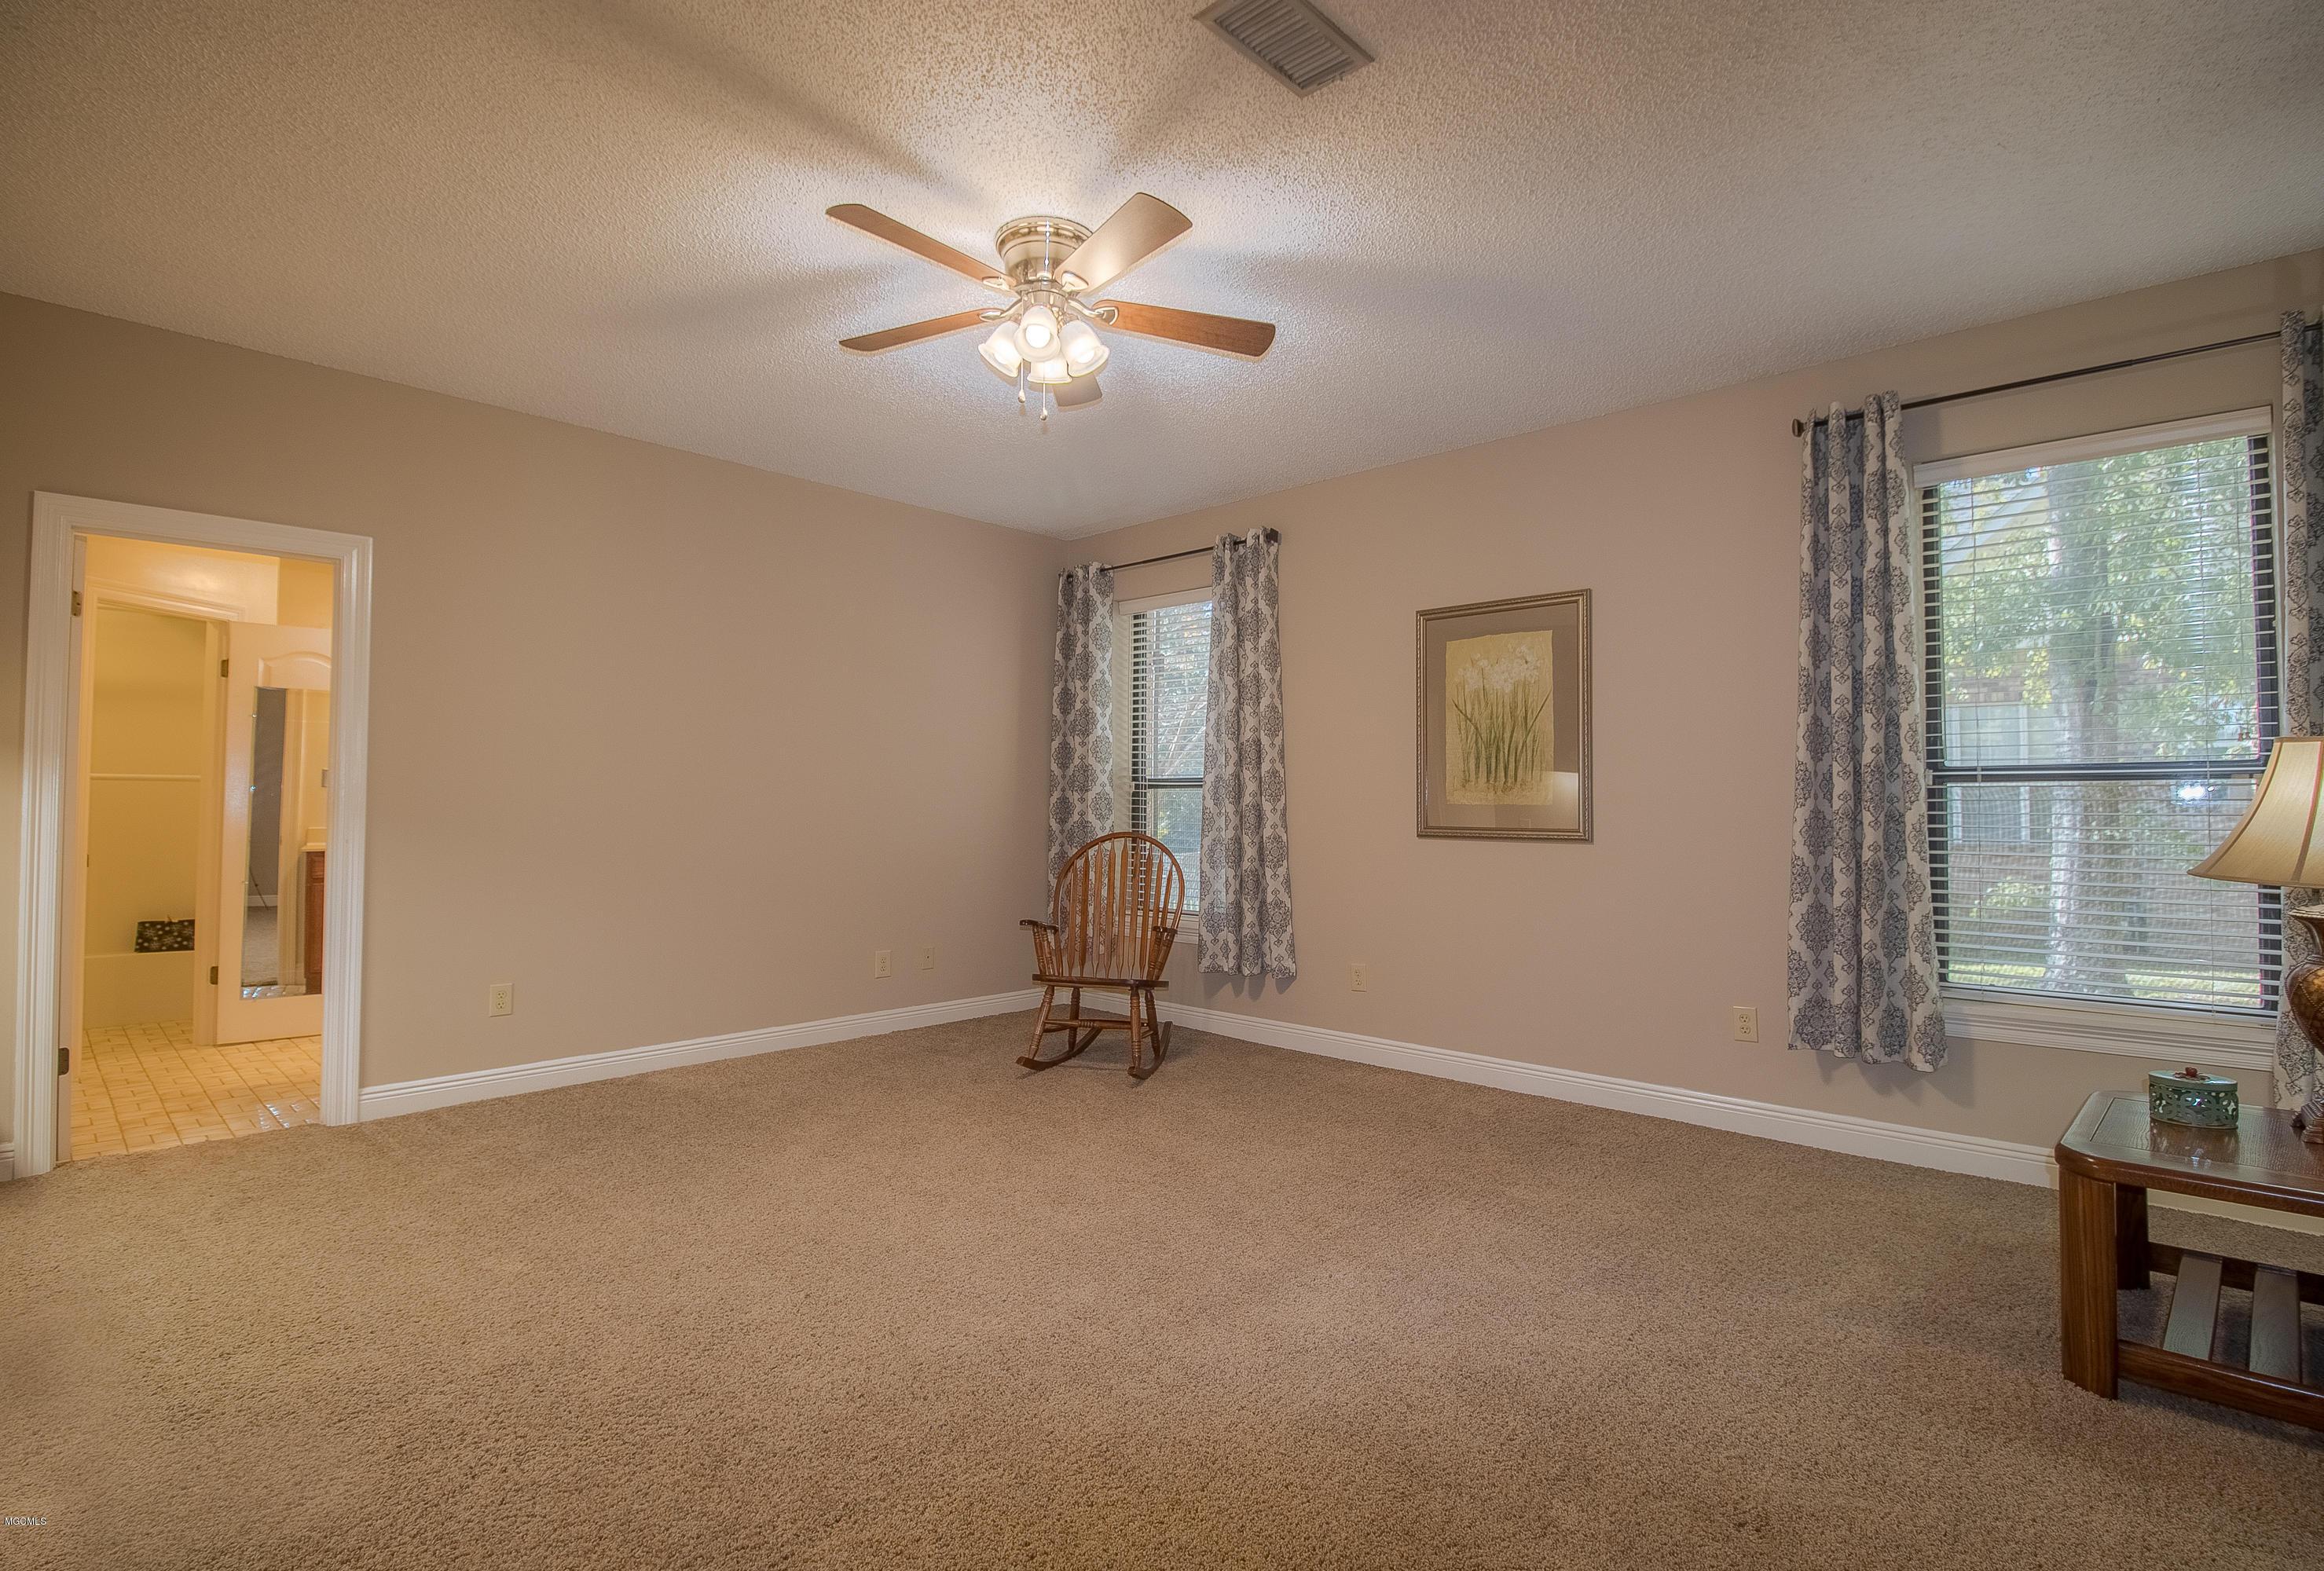 9089 Scenic River Dr, Biloxi, Mississippi 39532, 3 Bedrooms Bedrooms, ,3 BathroomsBathrooms,Single-family,For Sale,Scenic River,340555